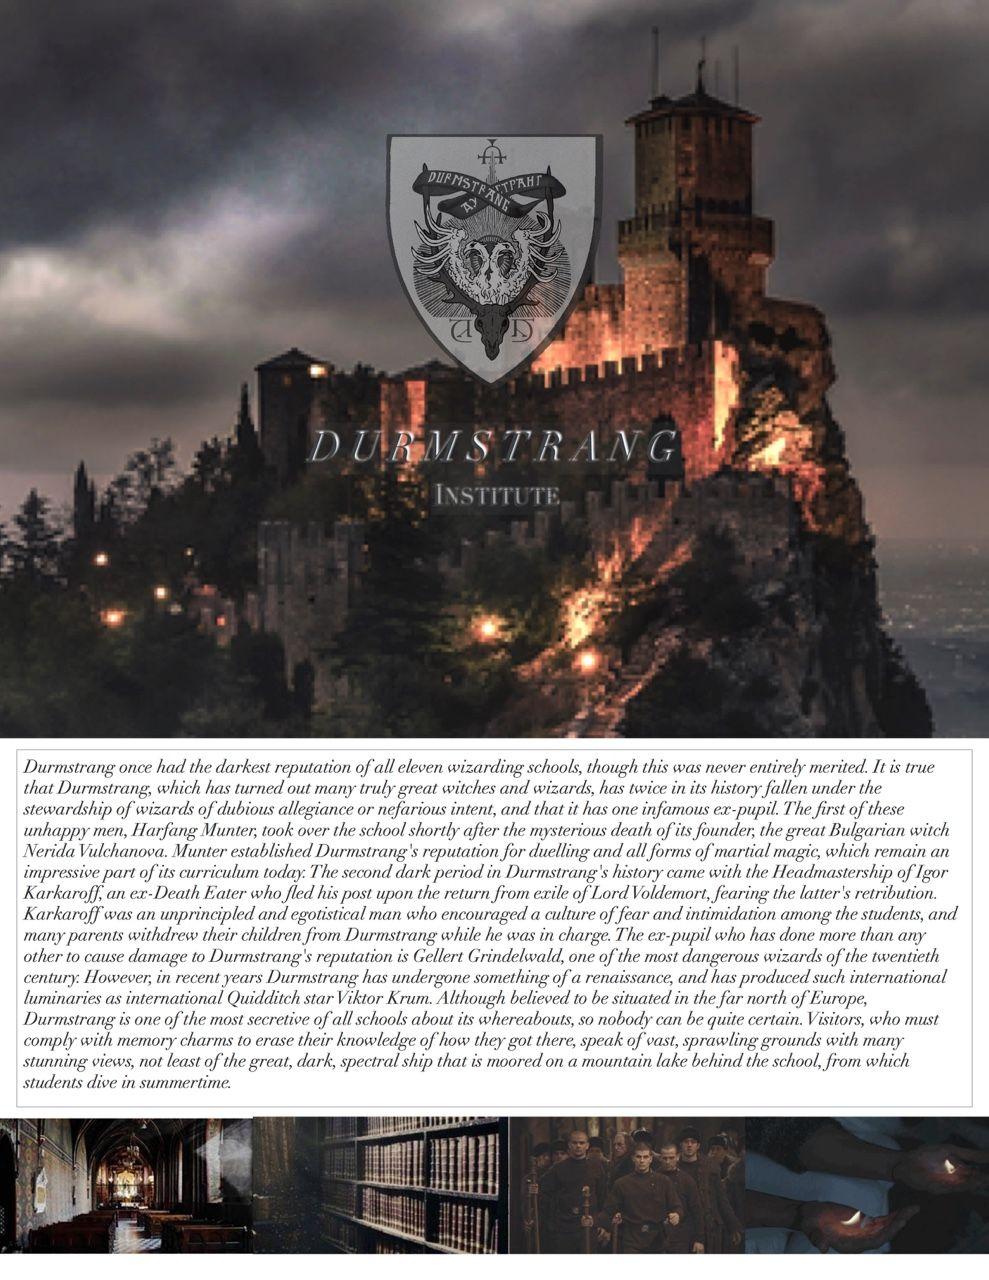 Harry Potter Aesthetics Wizarding Schools Durmstrang Institute Hogwarts Harry Potter Series Harry Potter Jk Rowling Bueno es hora de cambiar este sinónimo, miyla krum es la hermana me. harry potter jk rowling